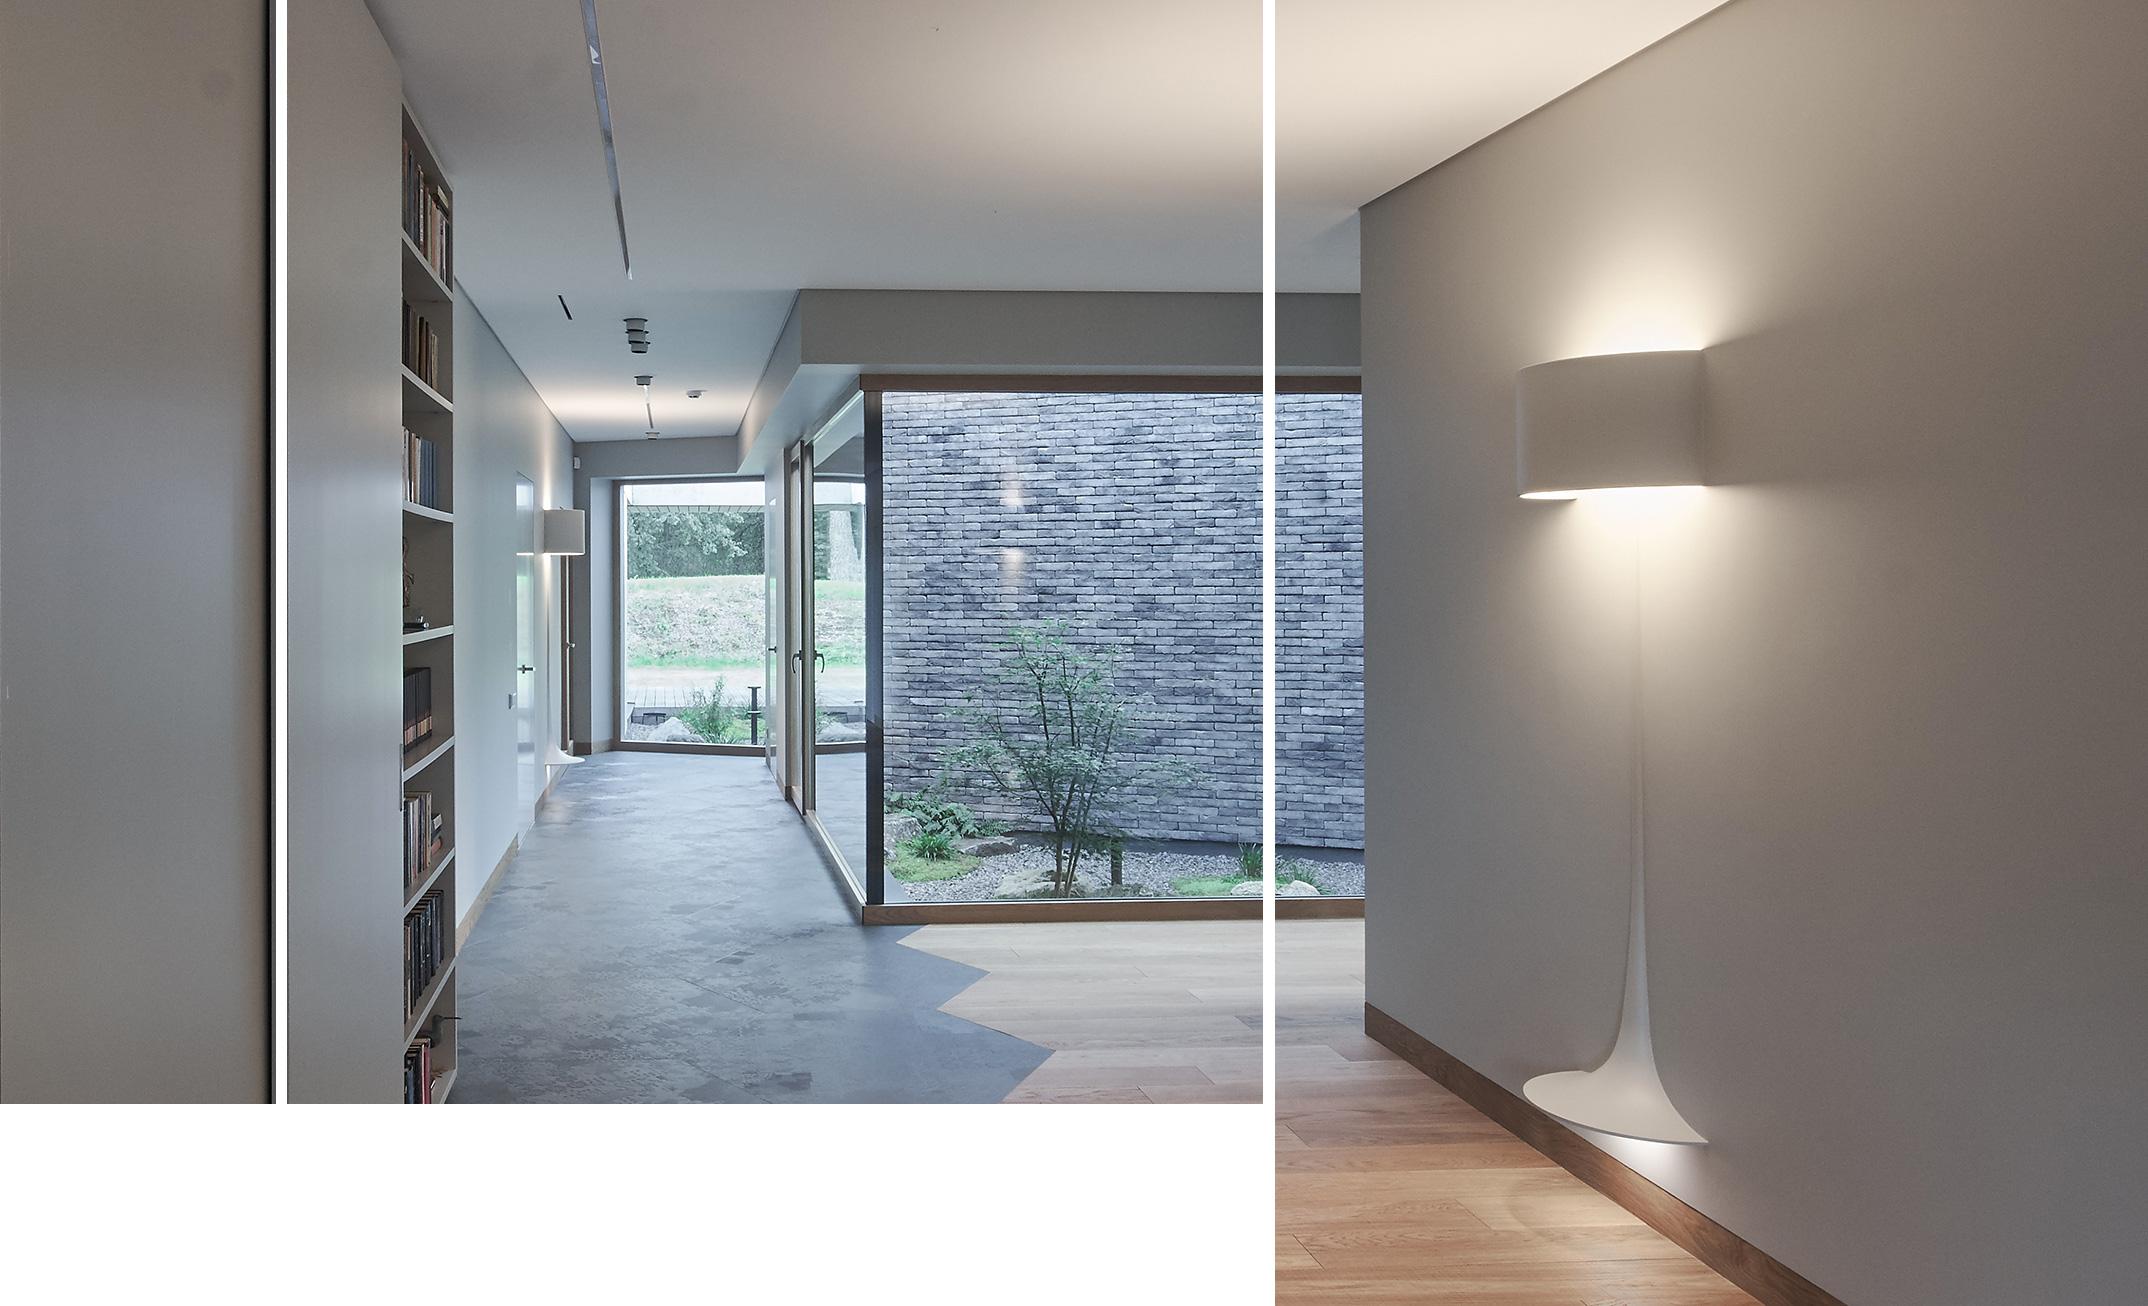 EJtekstile–-interjero-tekstiles-projektavimo-studija--Interior-textile-design-studio-2.2